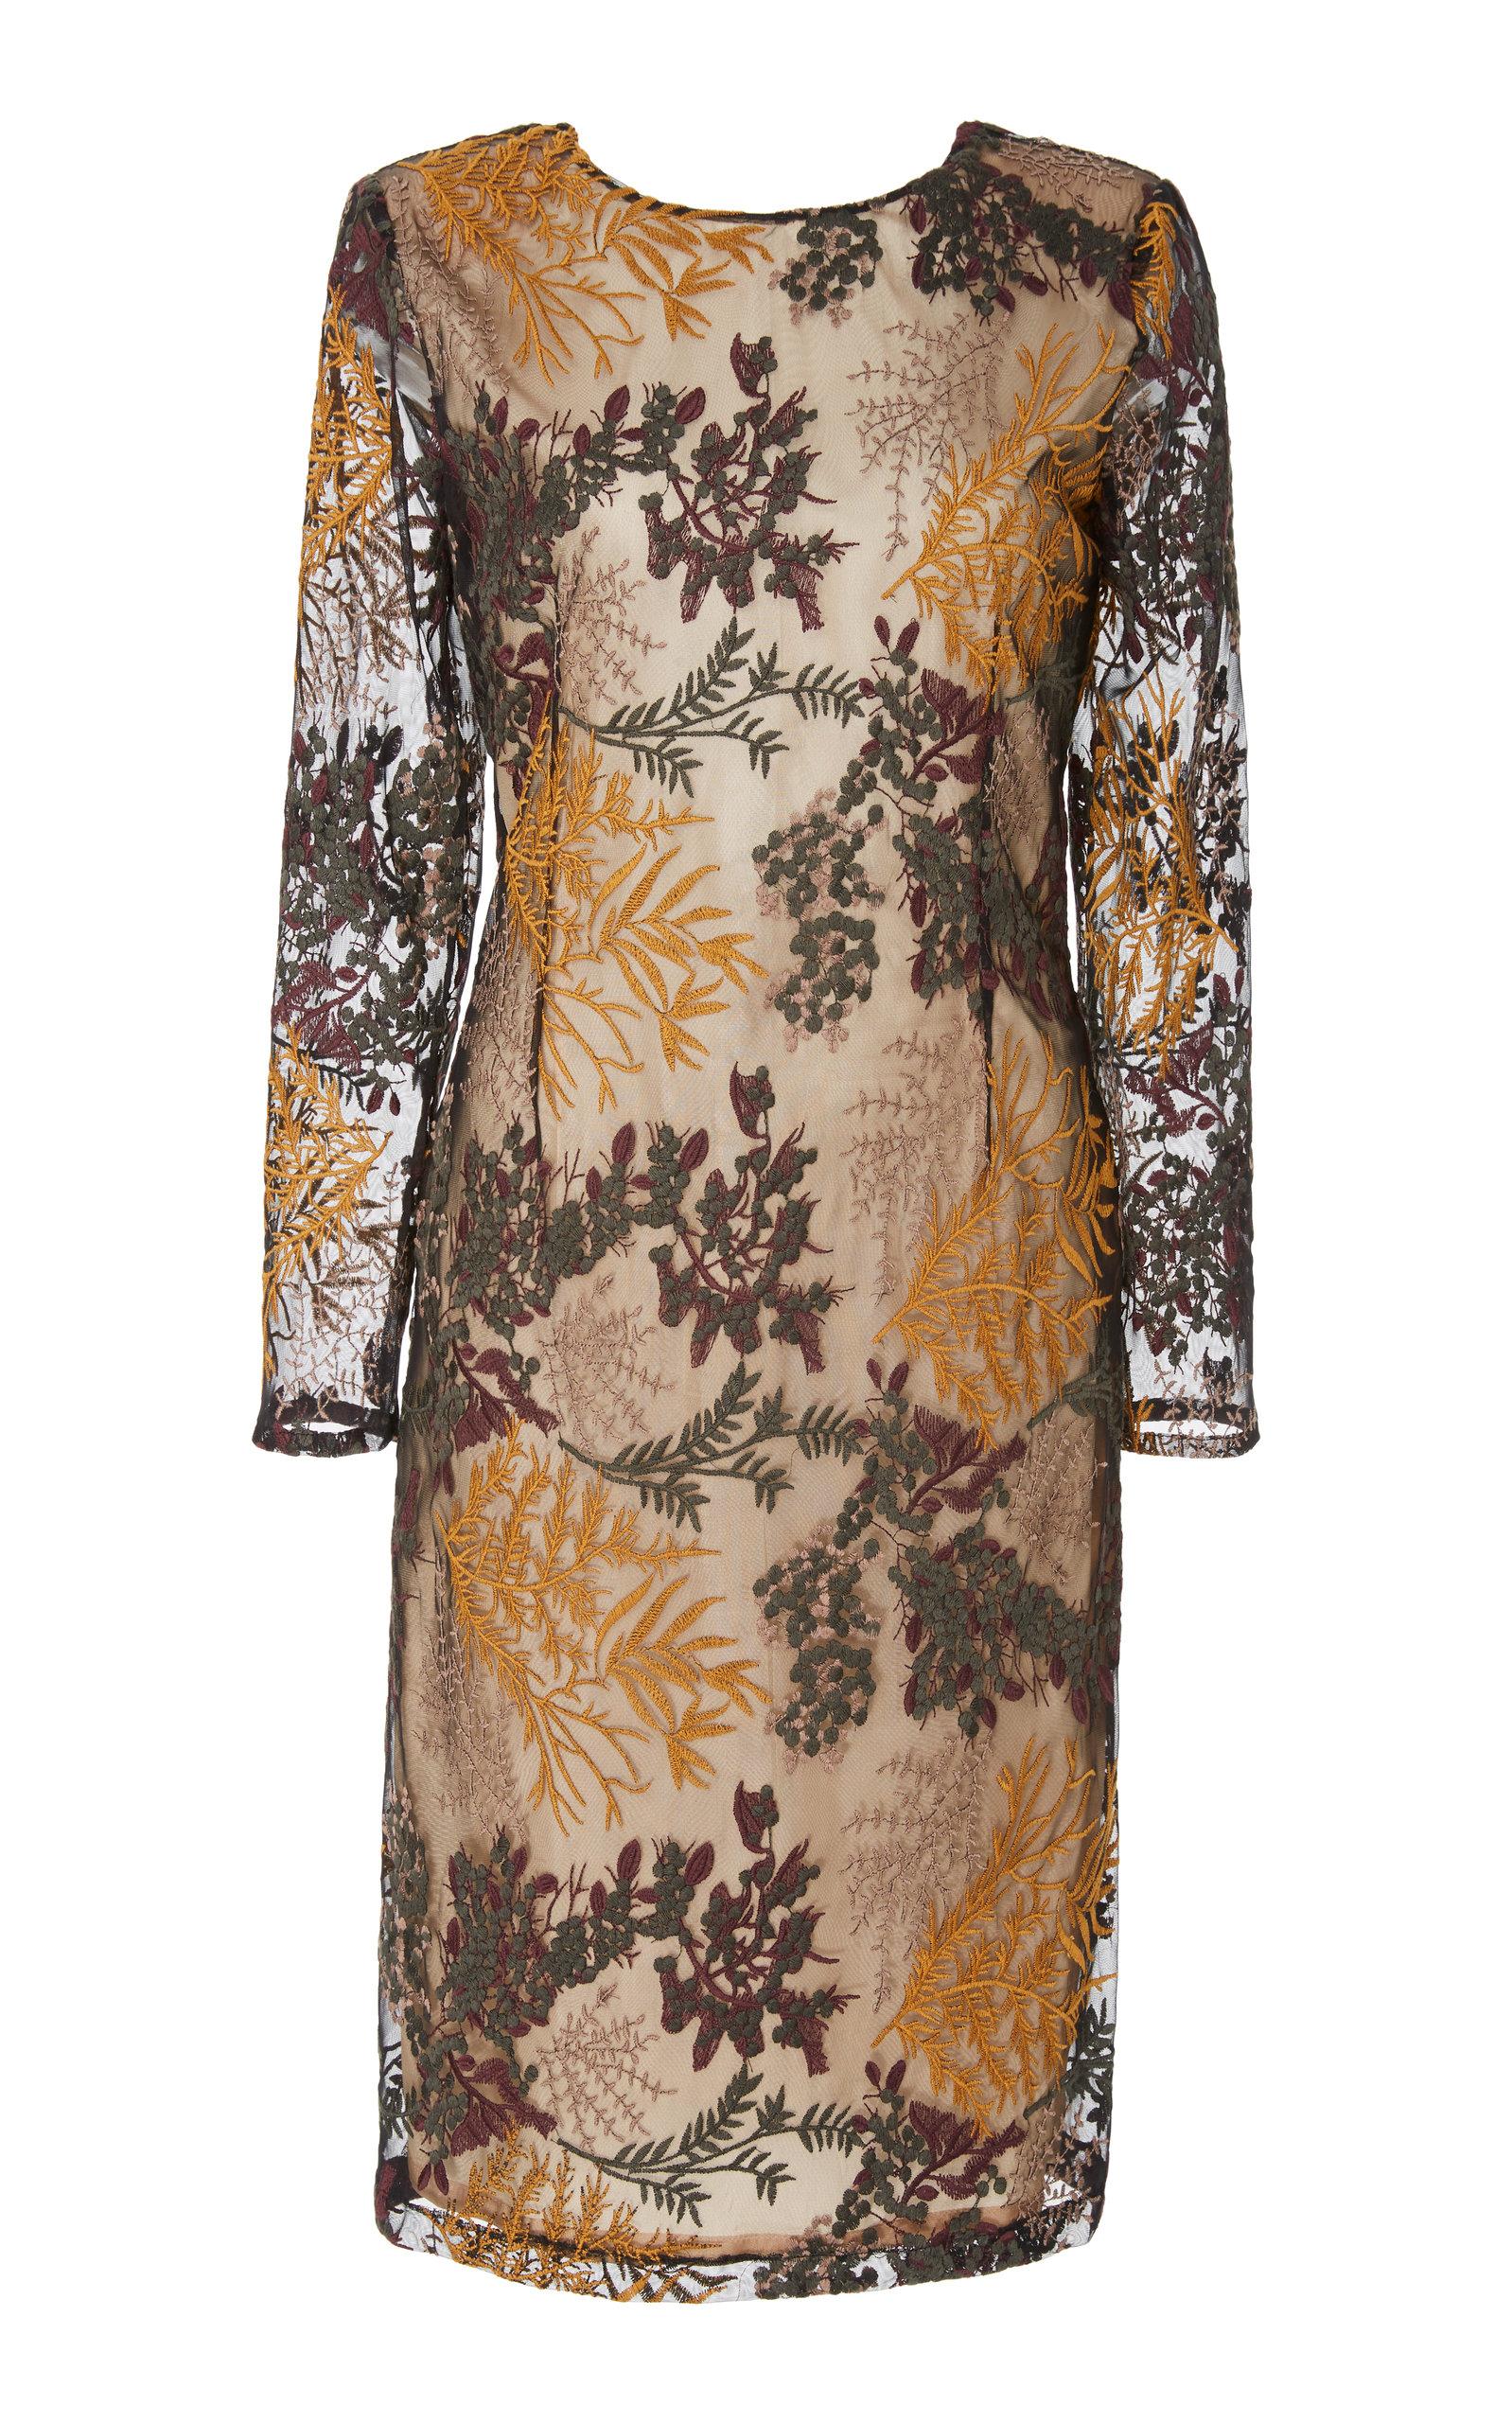 ALCOOLIQUE Peyton Tubolar Dress in Print